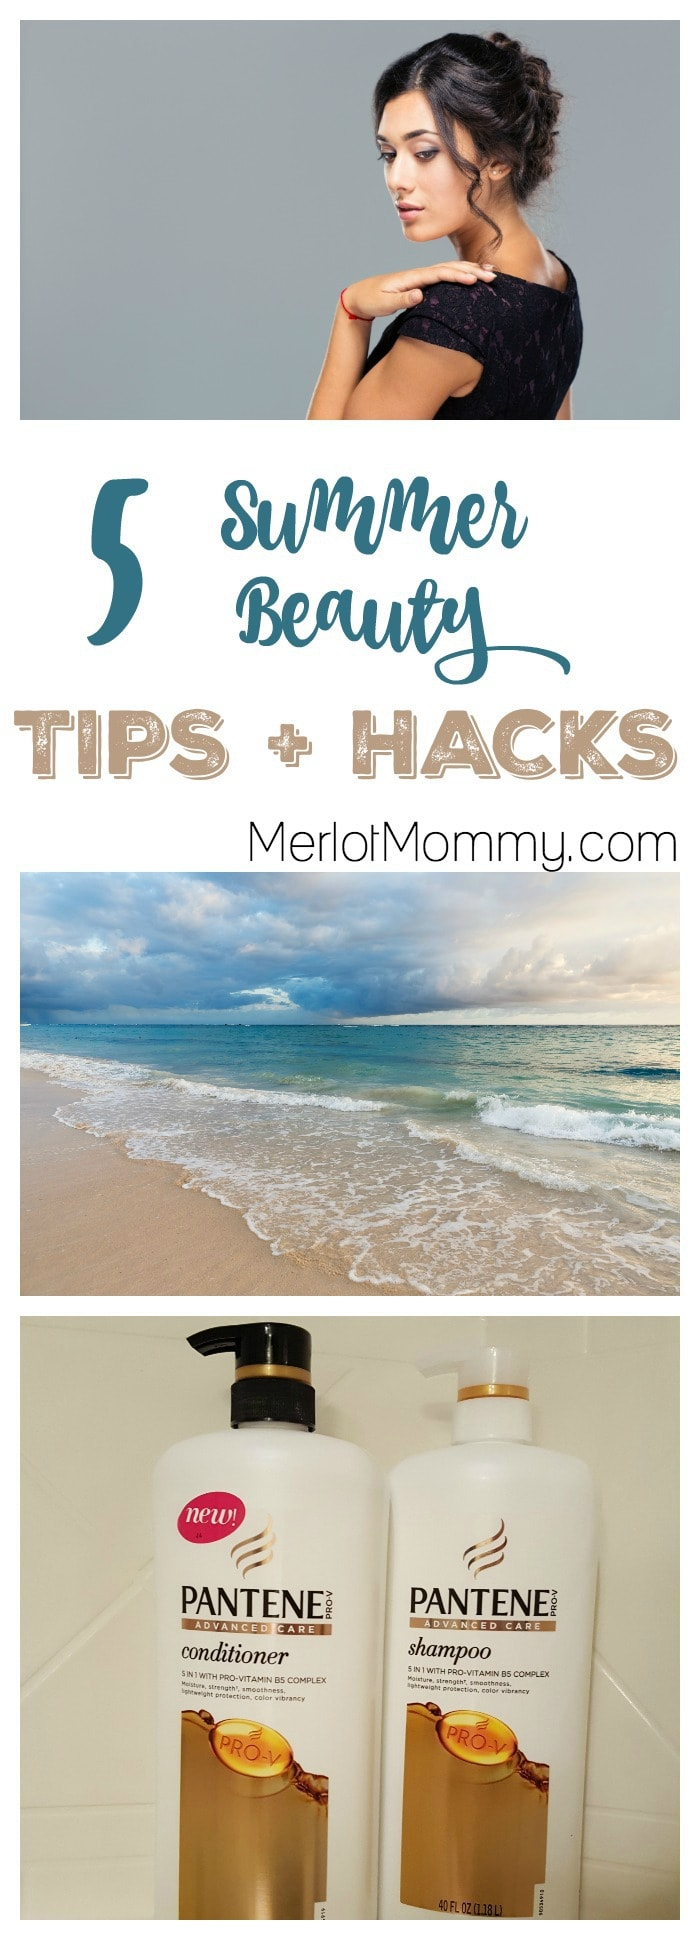 5 Summer Beauty Tips + Hacks